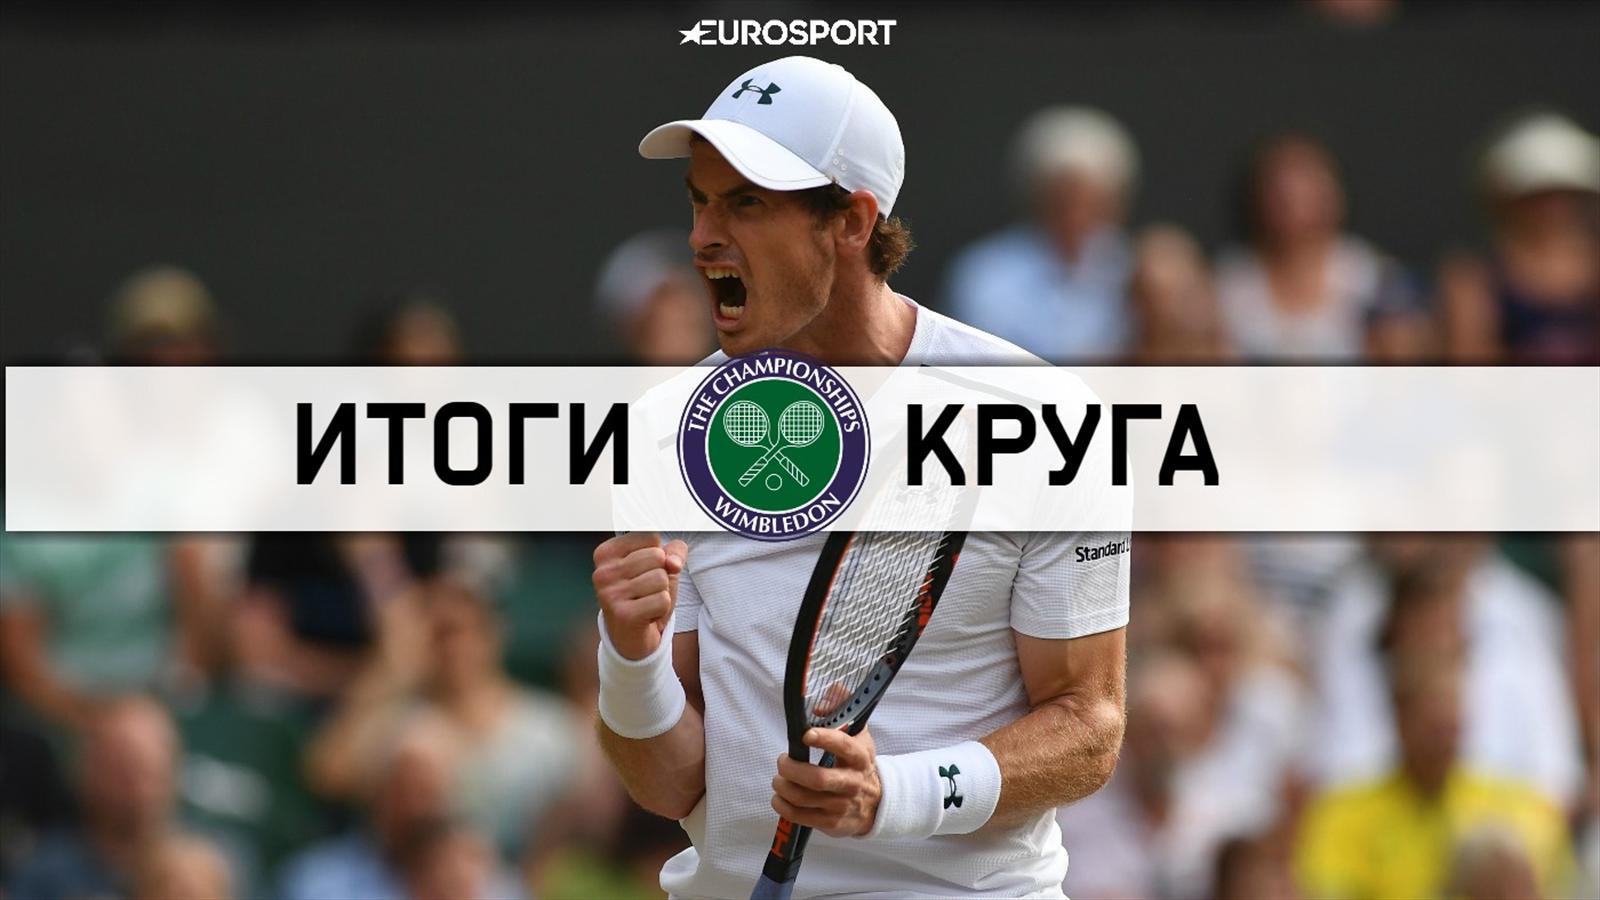 Уимблдон 2015: Энди Маррэй — Роджер Федерер